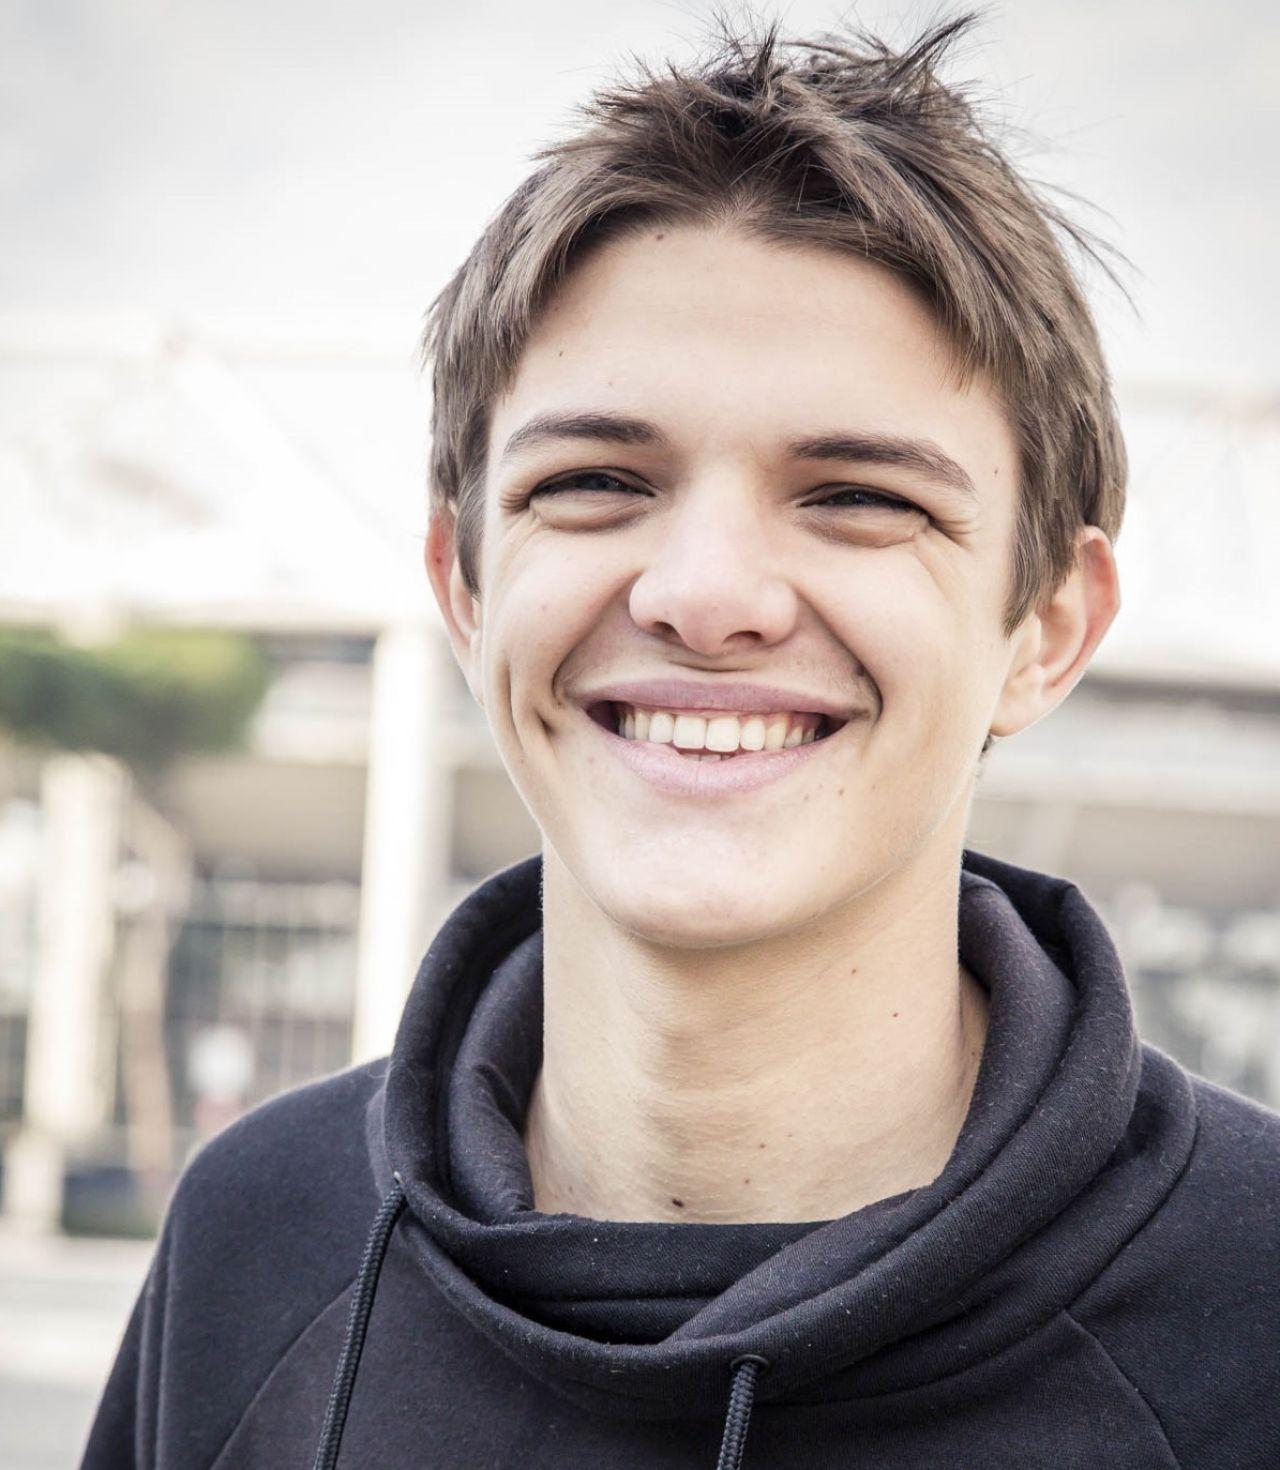 Luca Spinacara